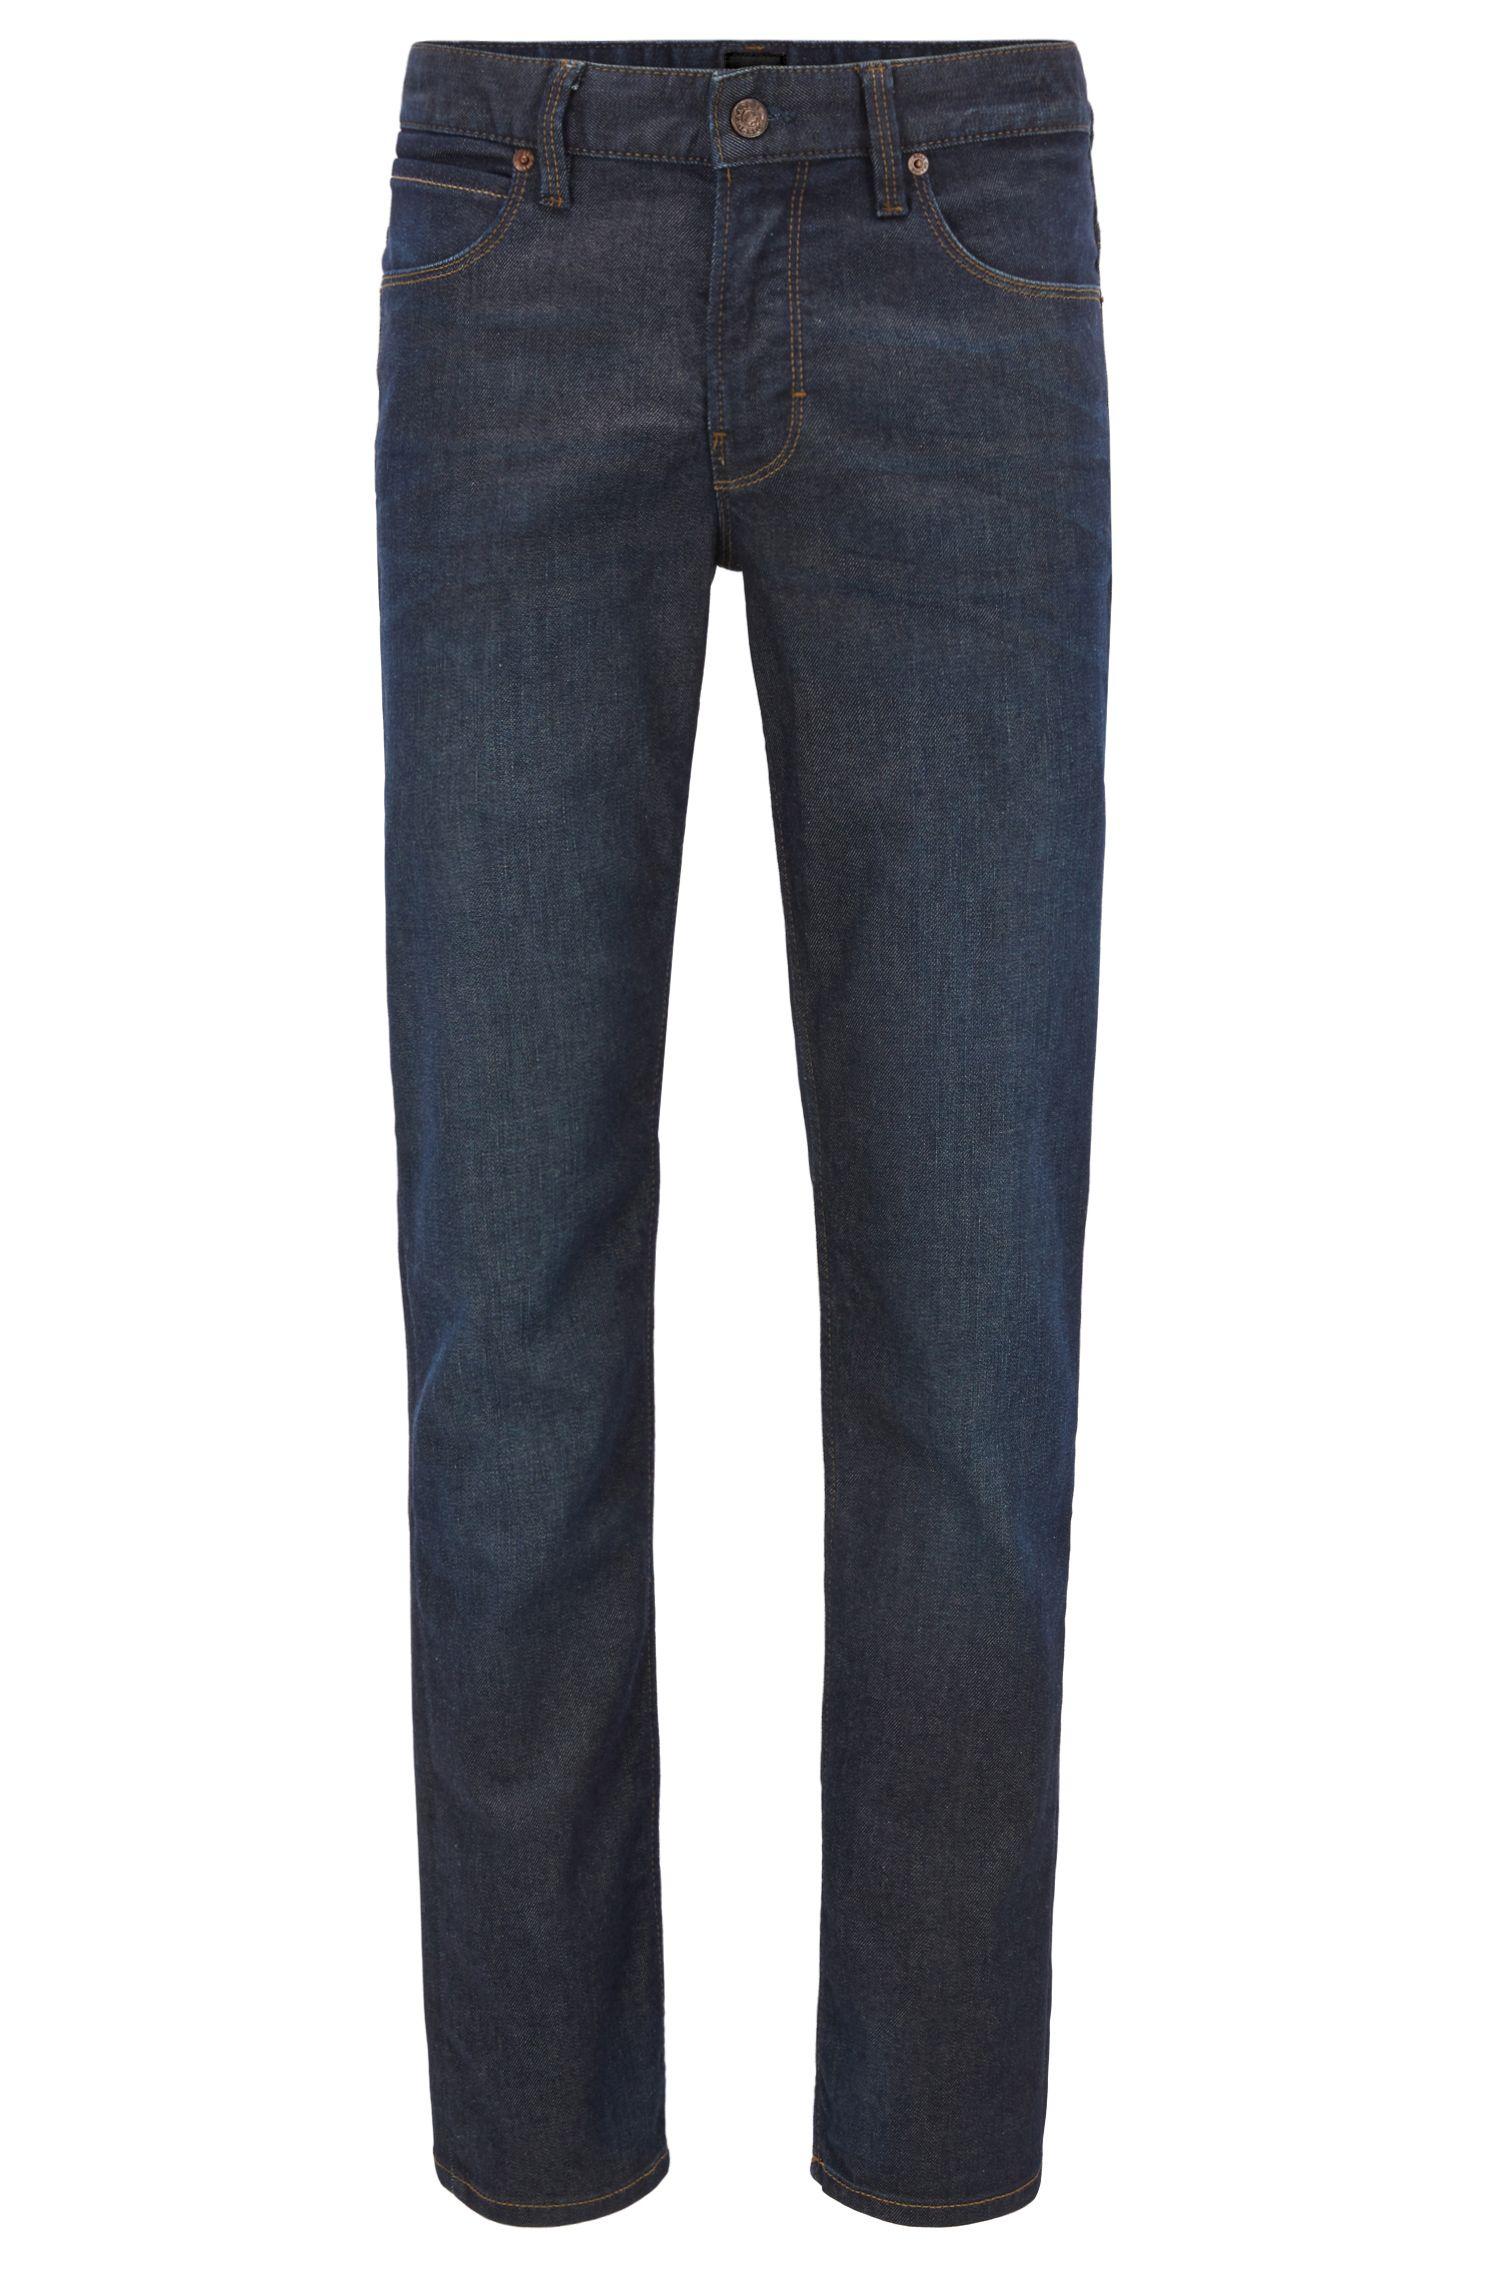 Slim-Fit Jeans aus indigofarbenem Stretch-Denim